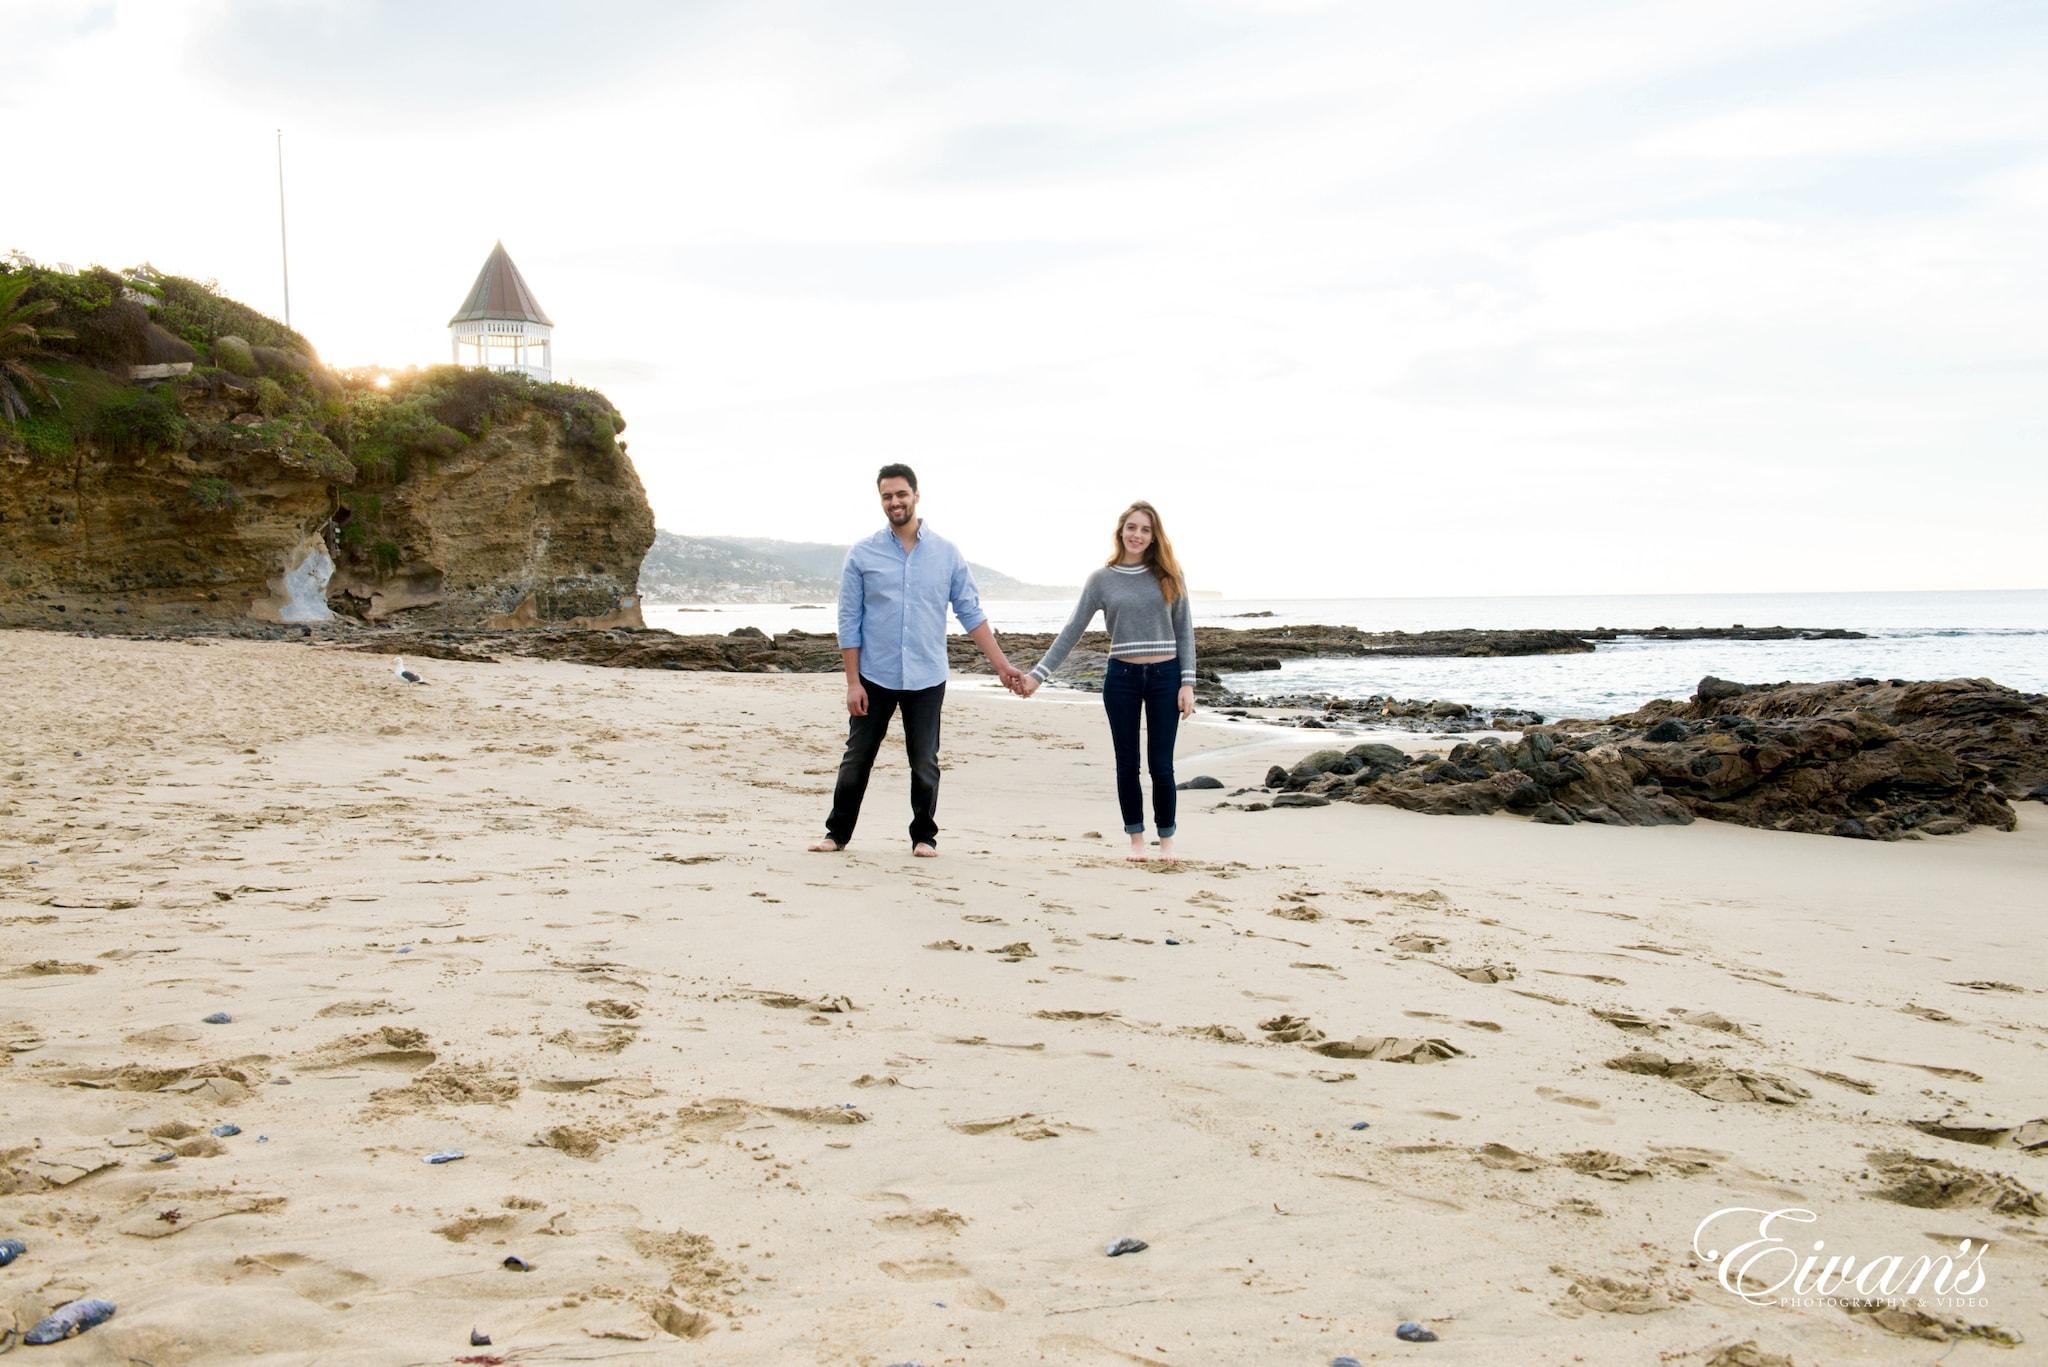 couple walking on beach during daytime